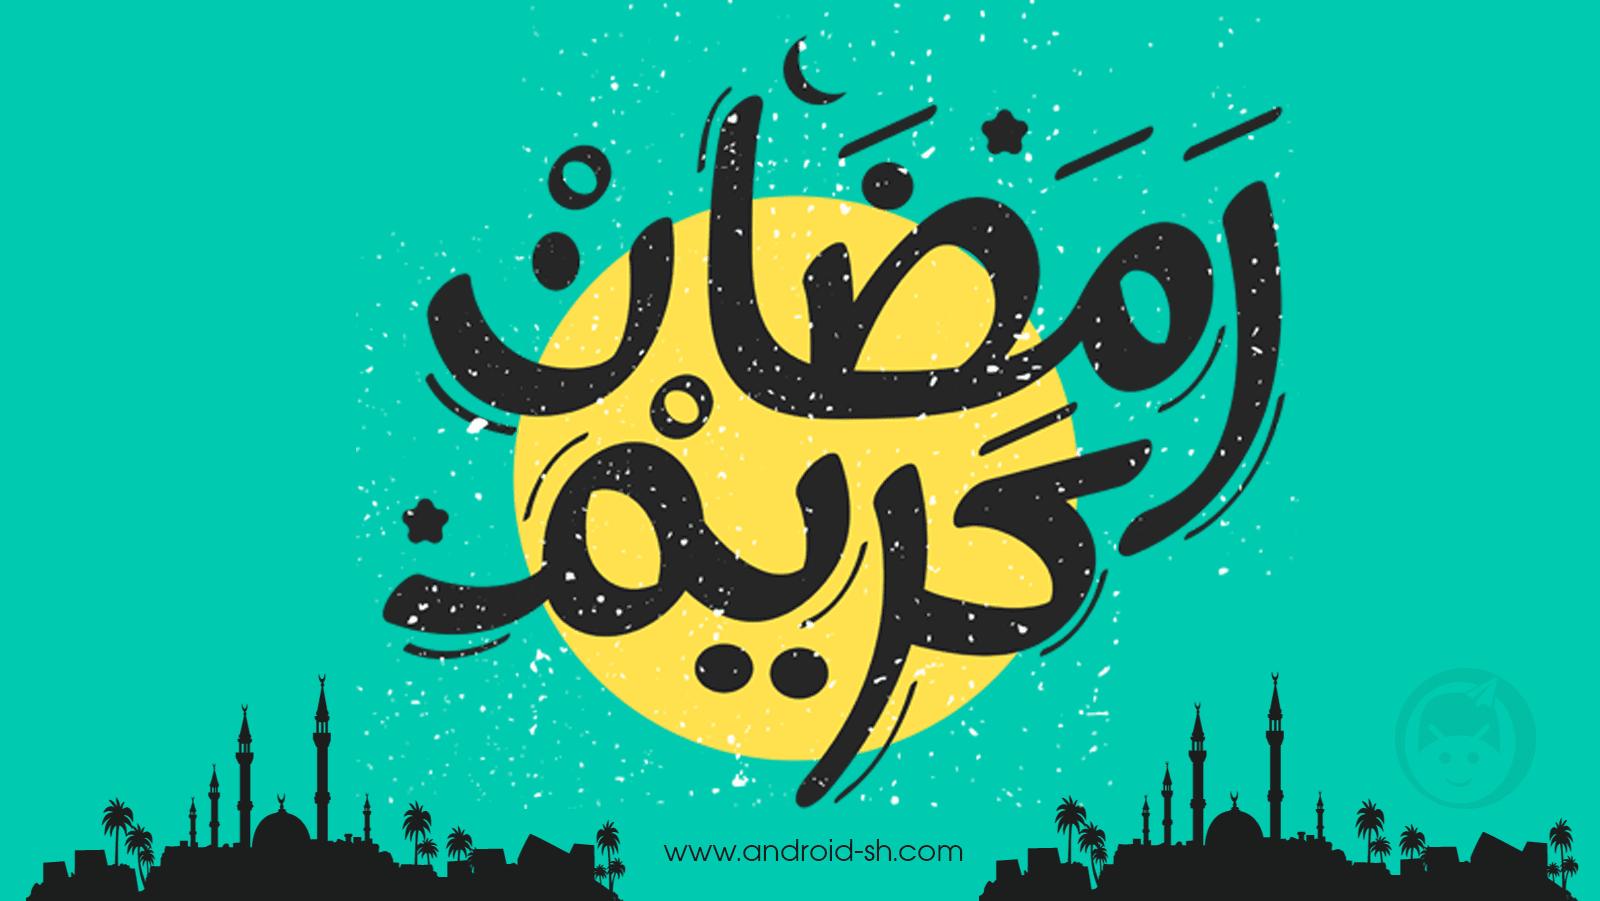 مجموعة مخطوطات لشهر رمضان 2018 كل عام وانتم بخير اندرويد شير